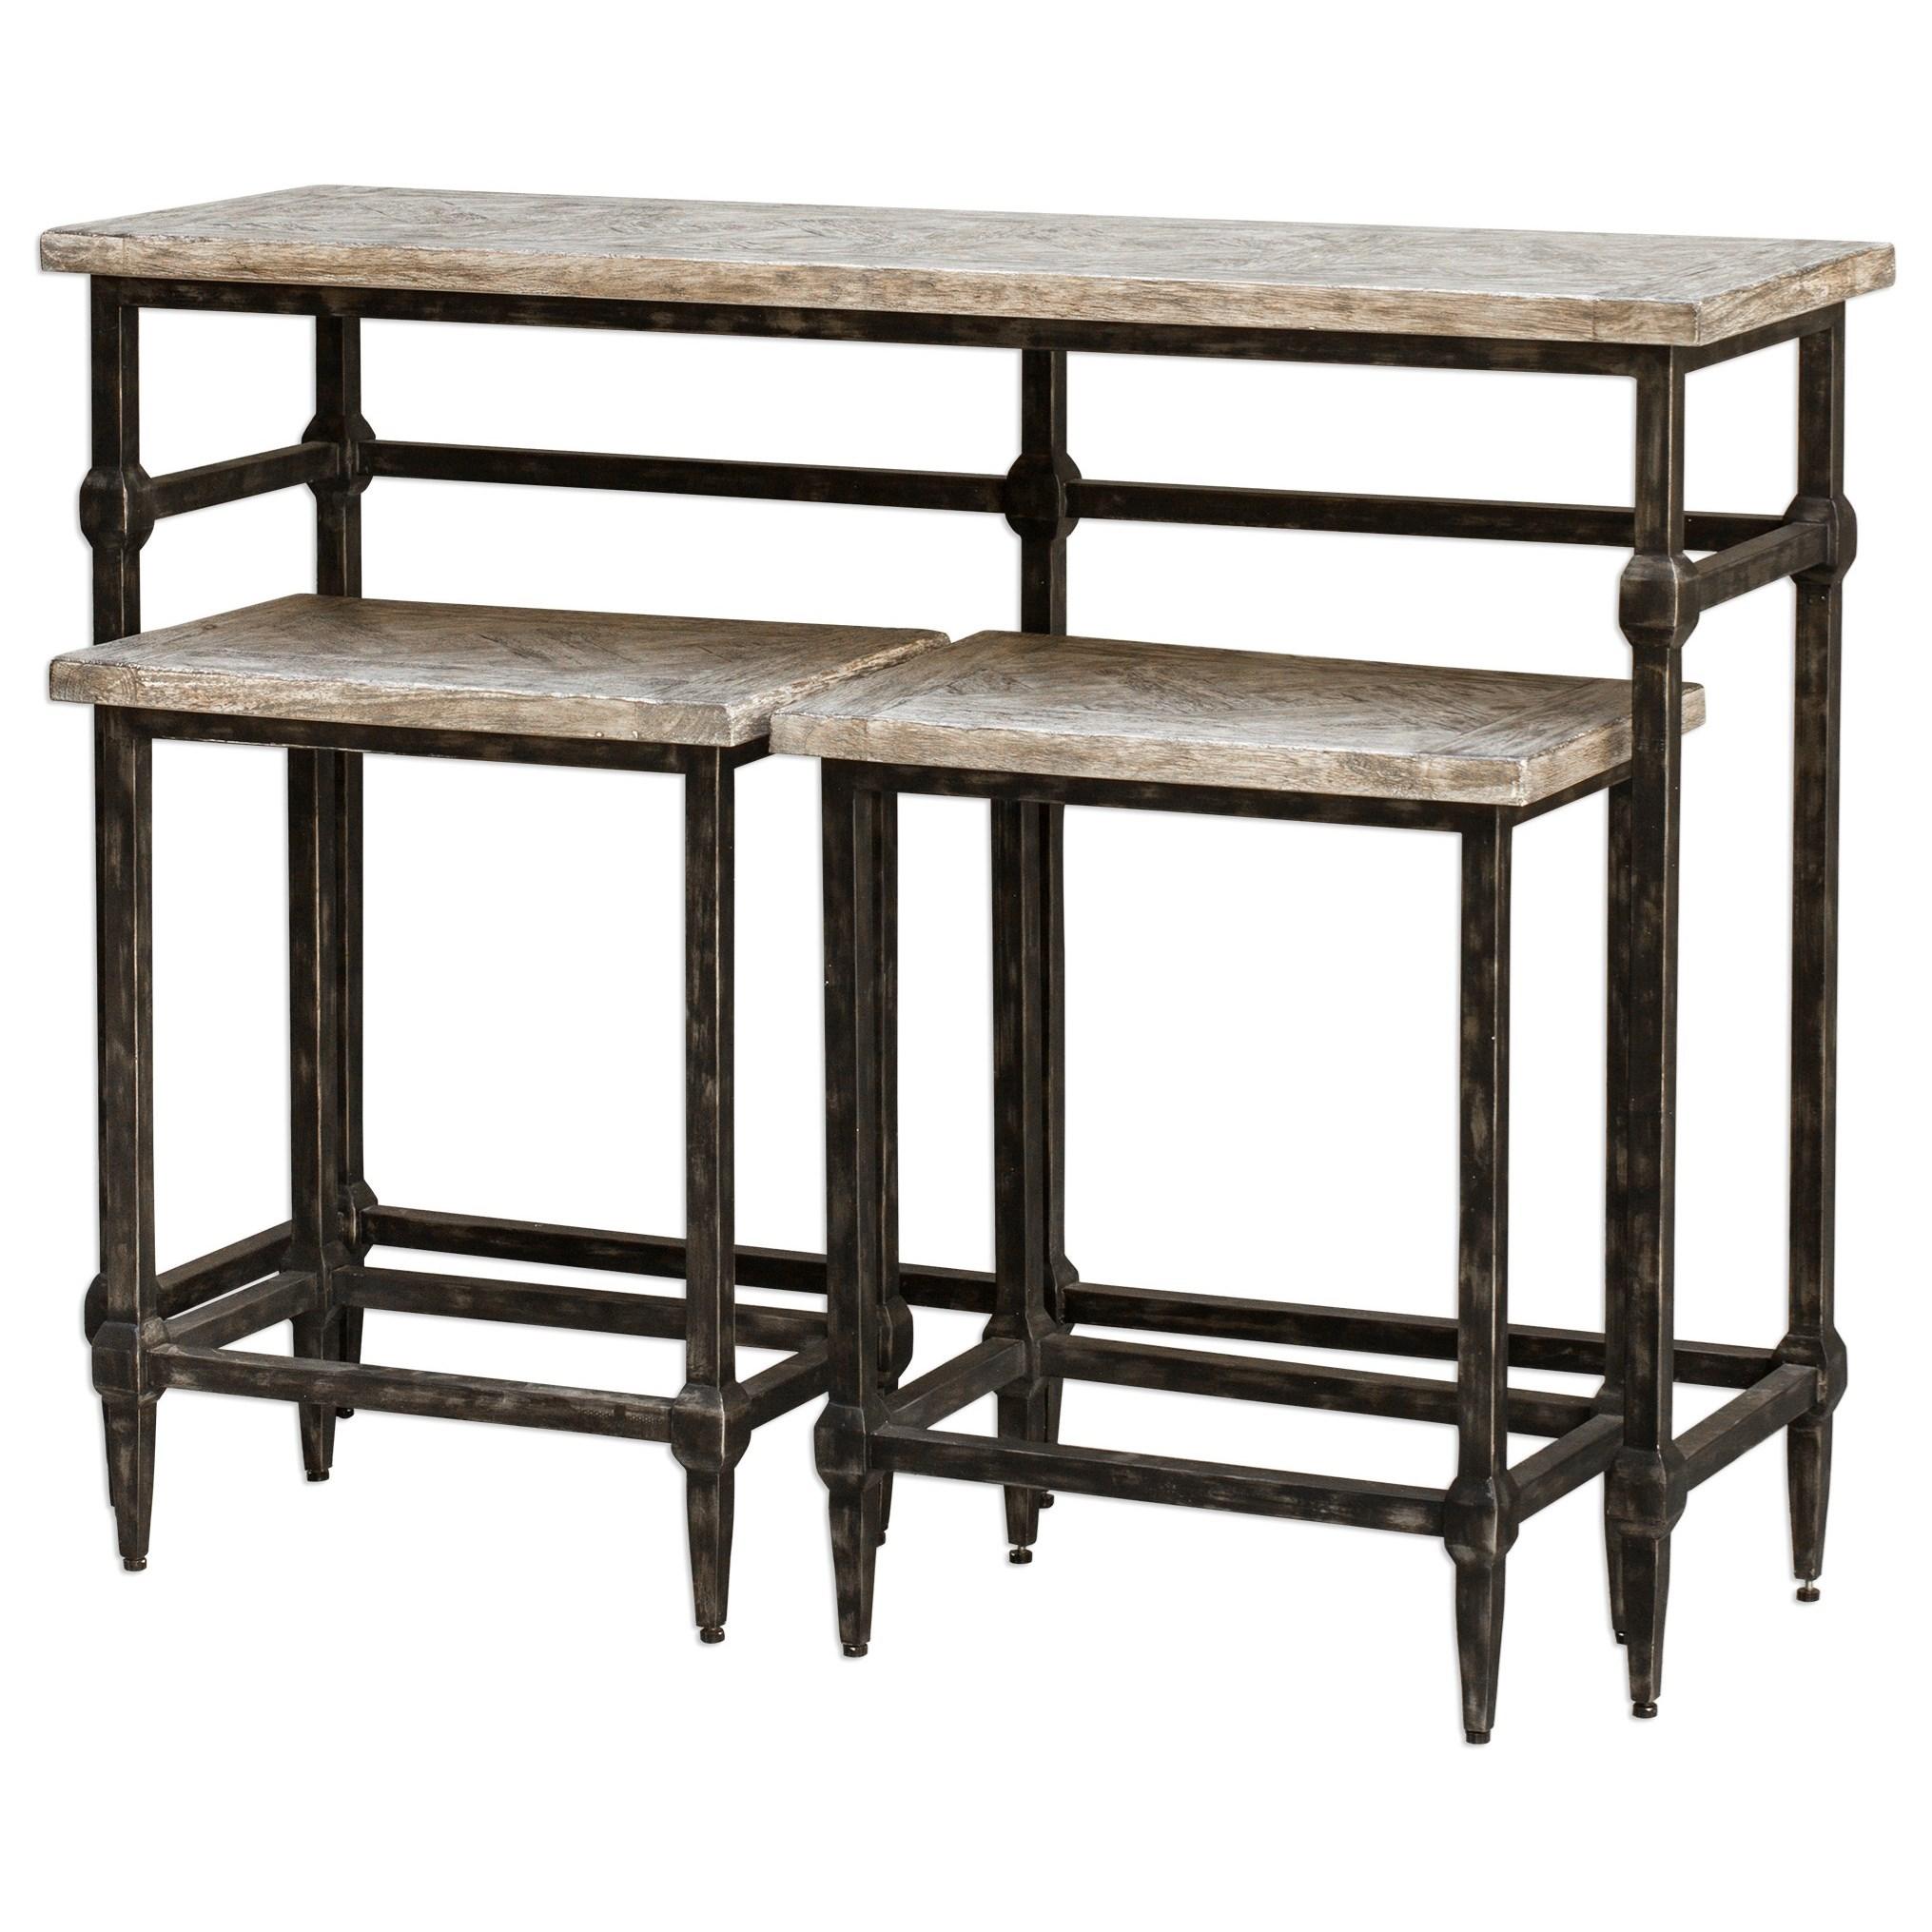 Accent Furniture Tameron Bistro Set S/3 by Uttermost at Mueller Furniture